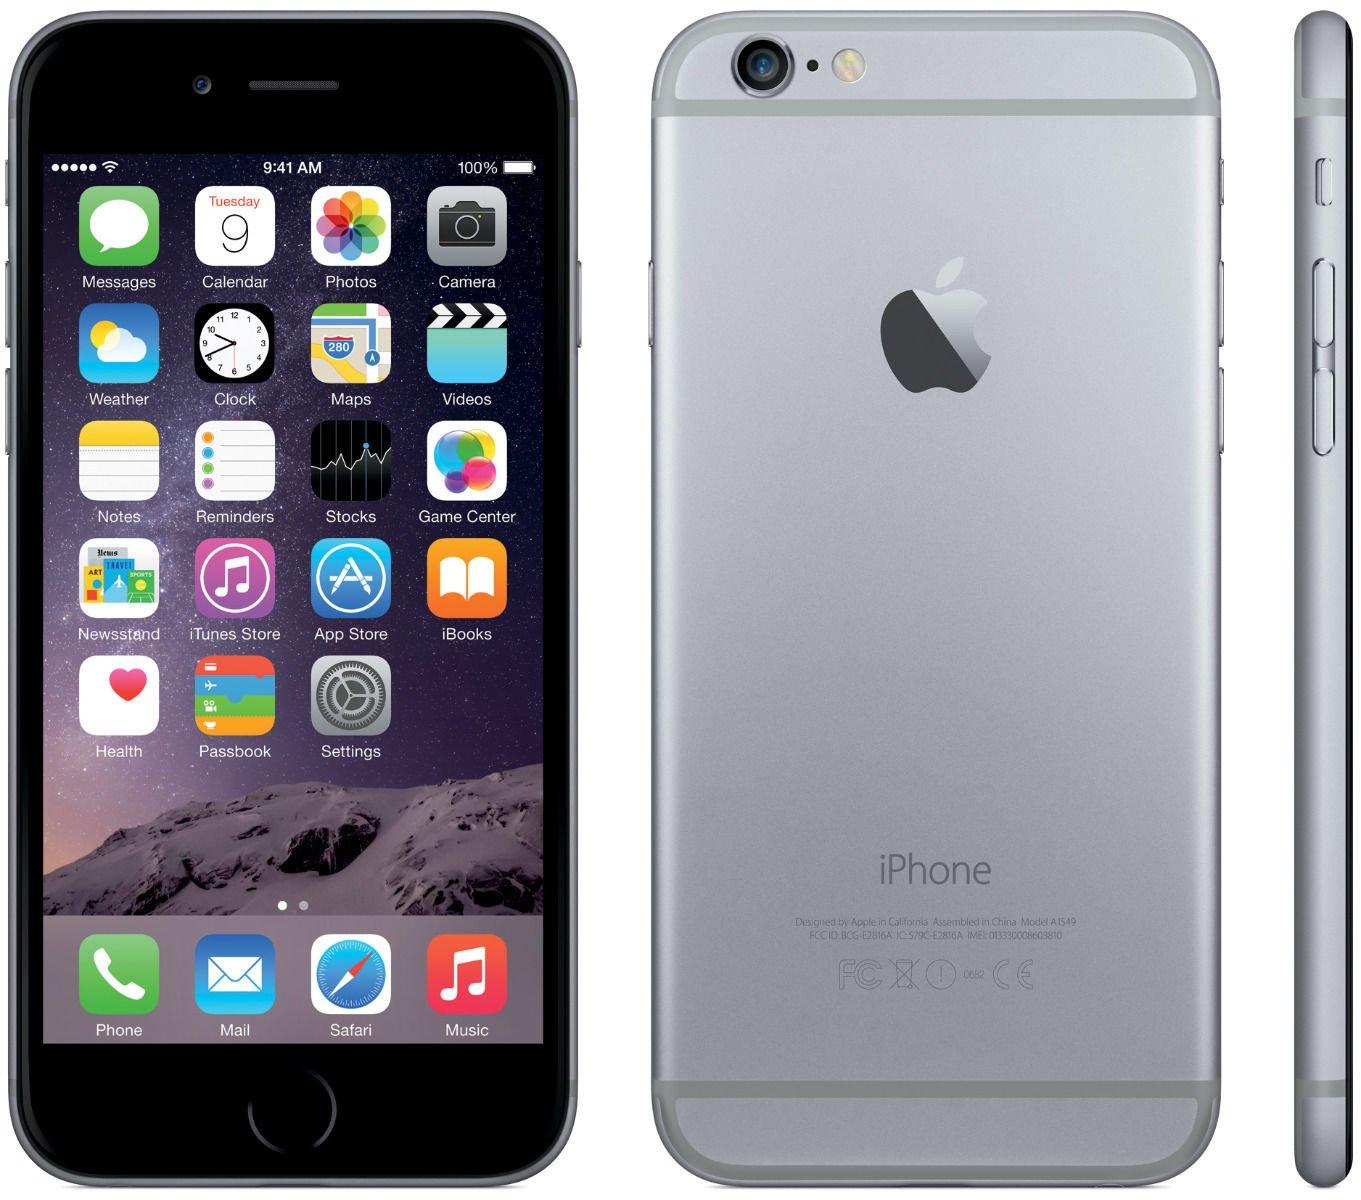 Apple iPhone 6, GSM Unlocked, 16GB - Space Gray (Renewed) by Apple (Image #1)